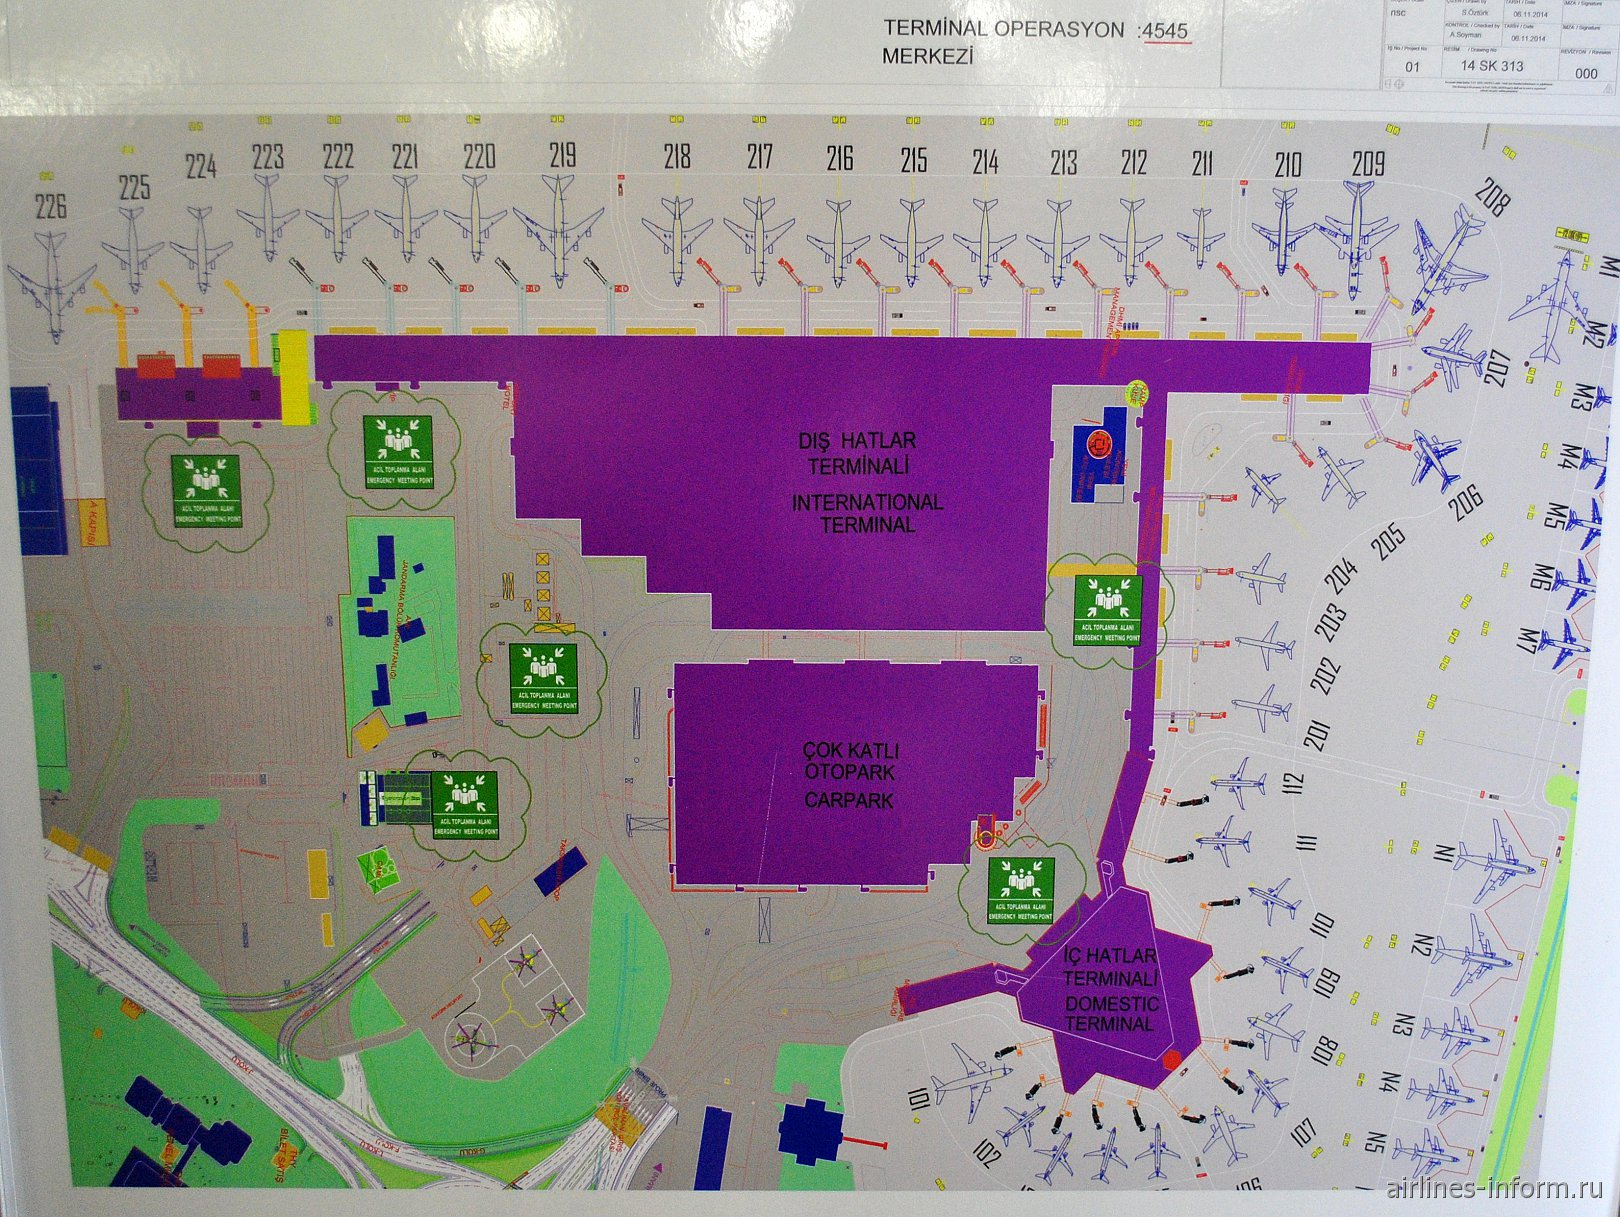 Схема аэропорт стамбула ататюрк терминал i